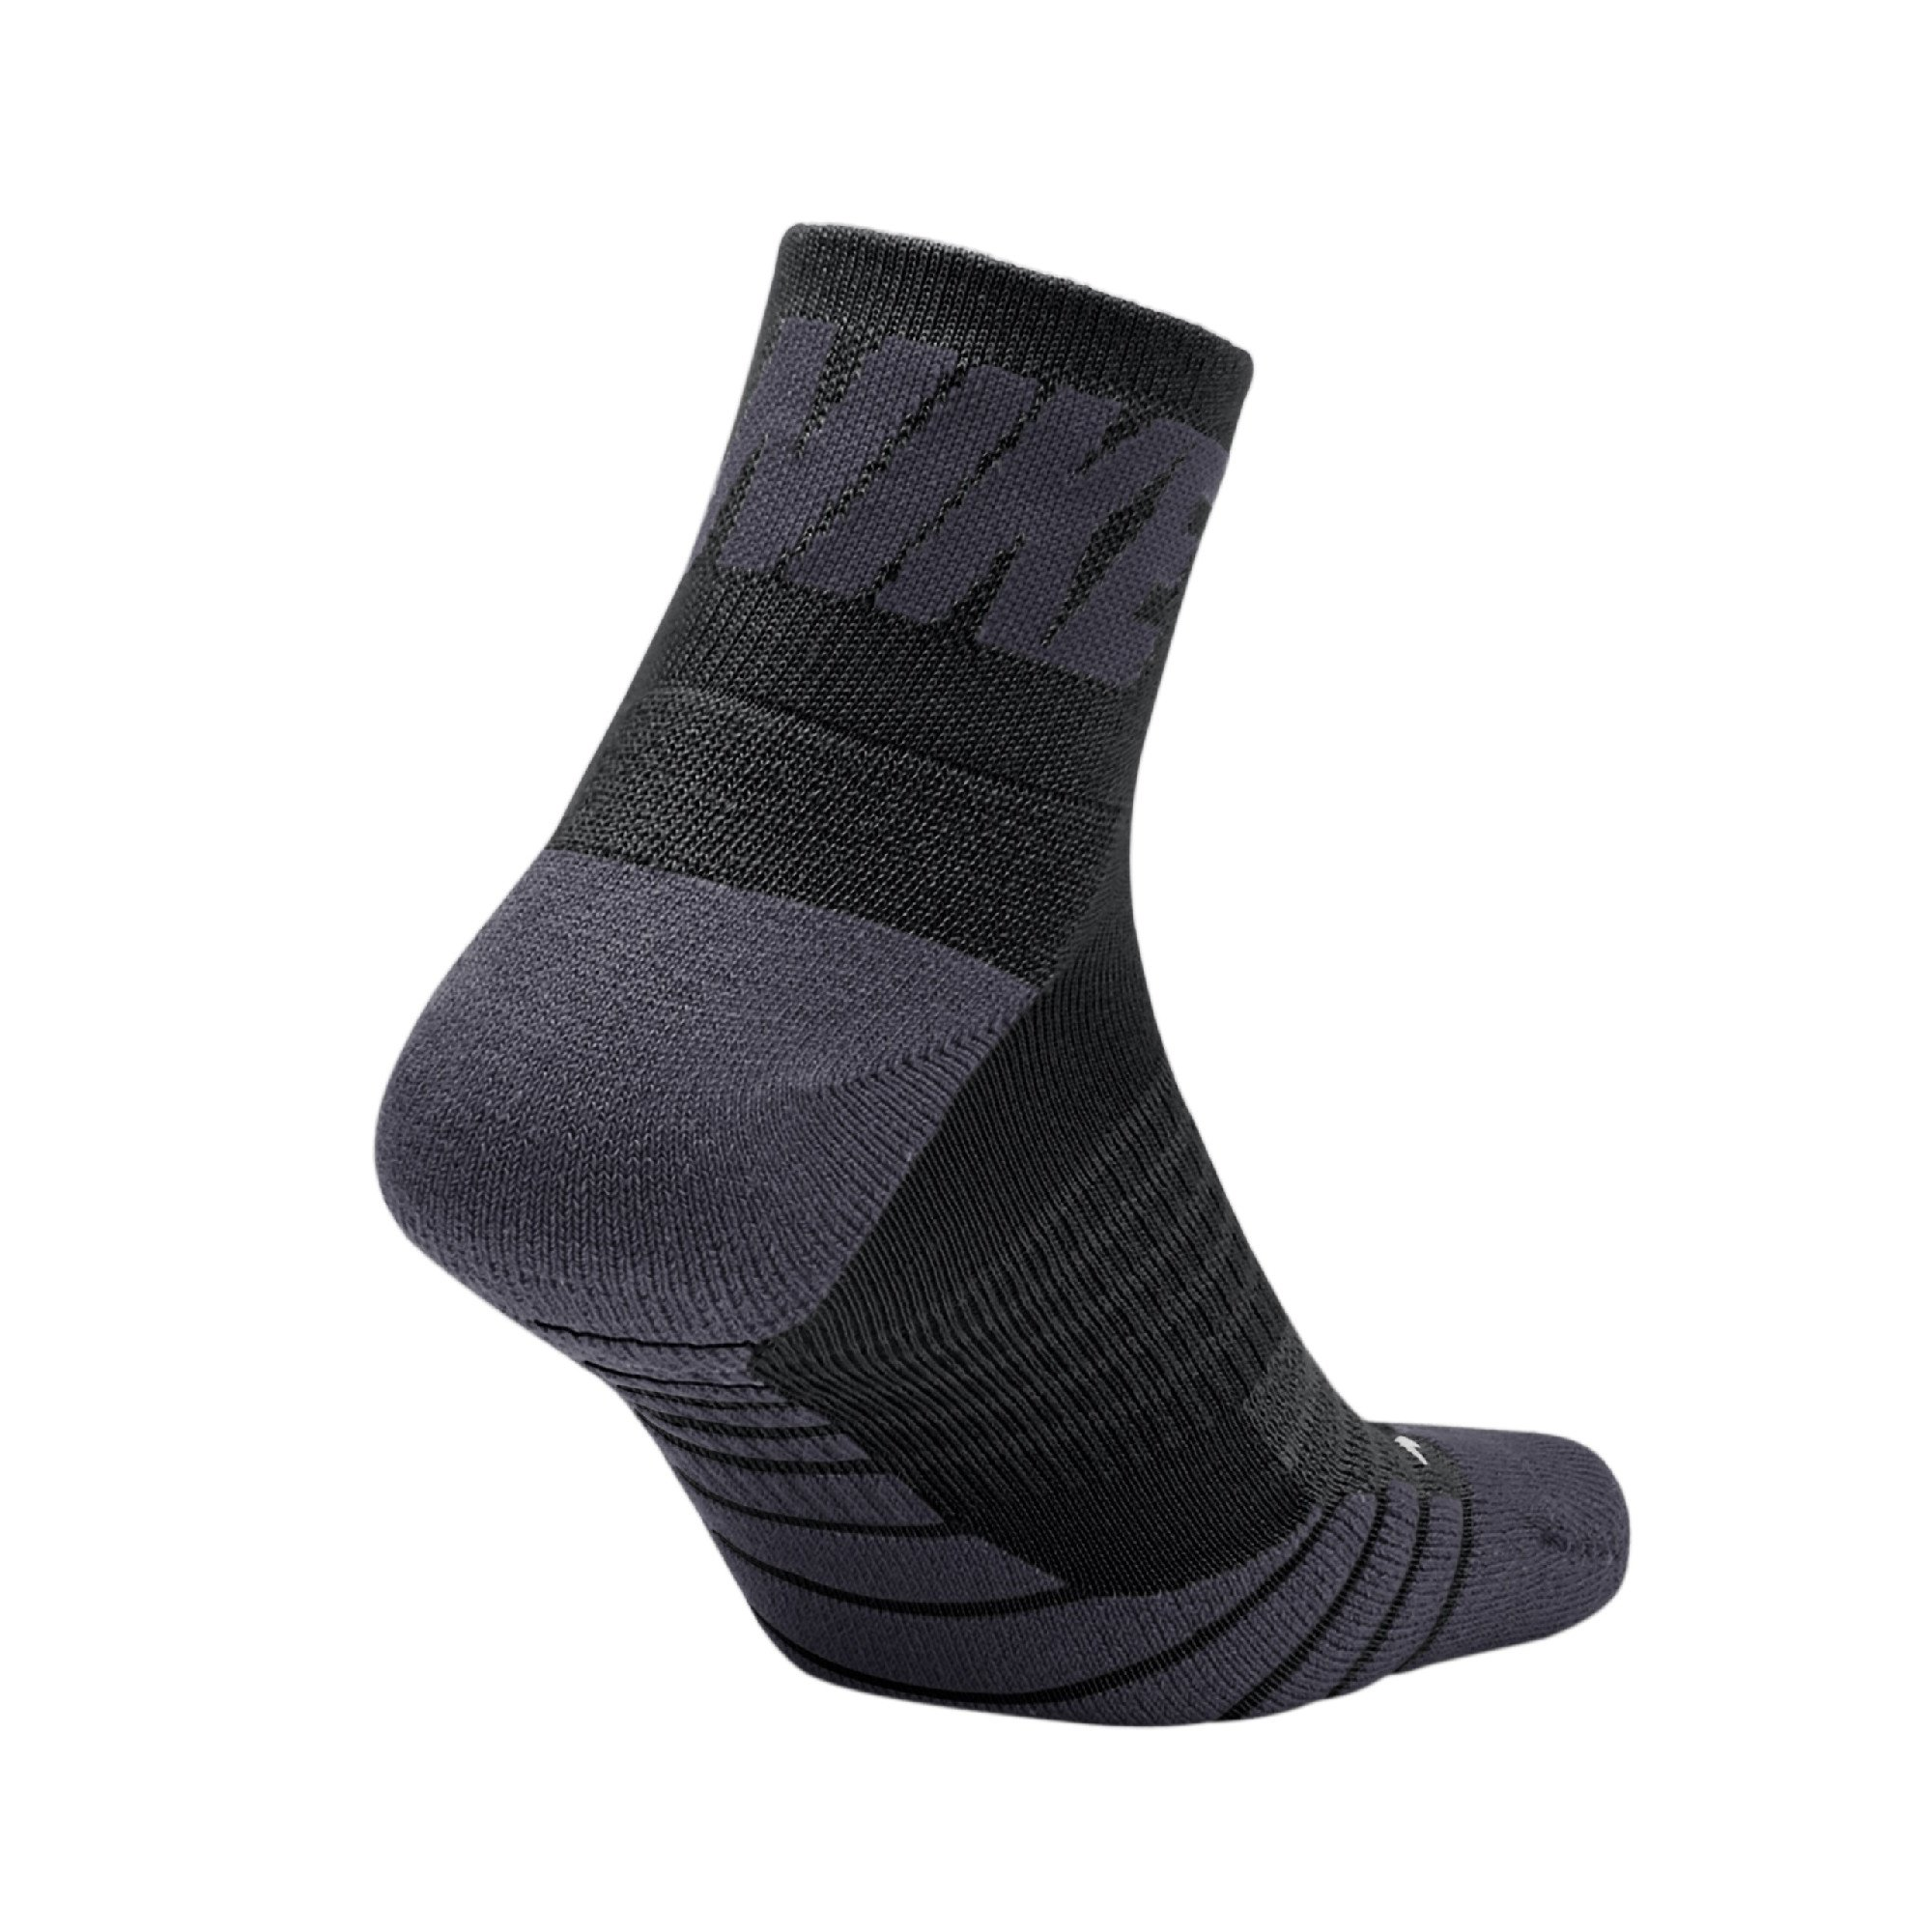 Nike Unisex Dry Cushioned Quarter High Golf Socks Black/Gray Large